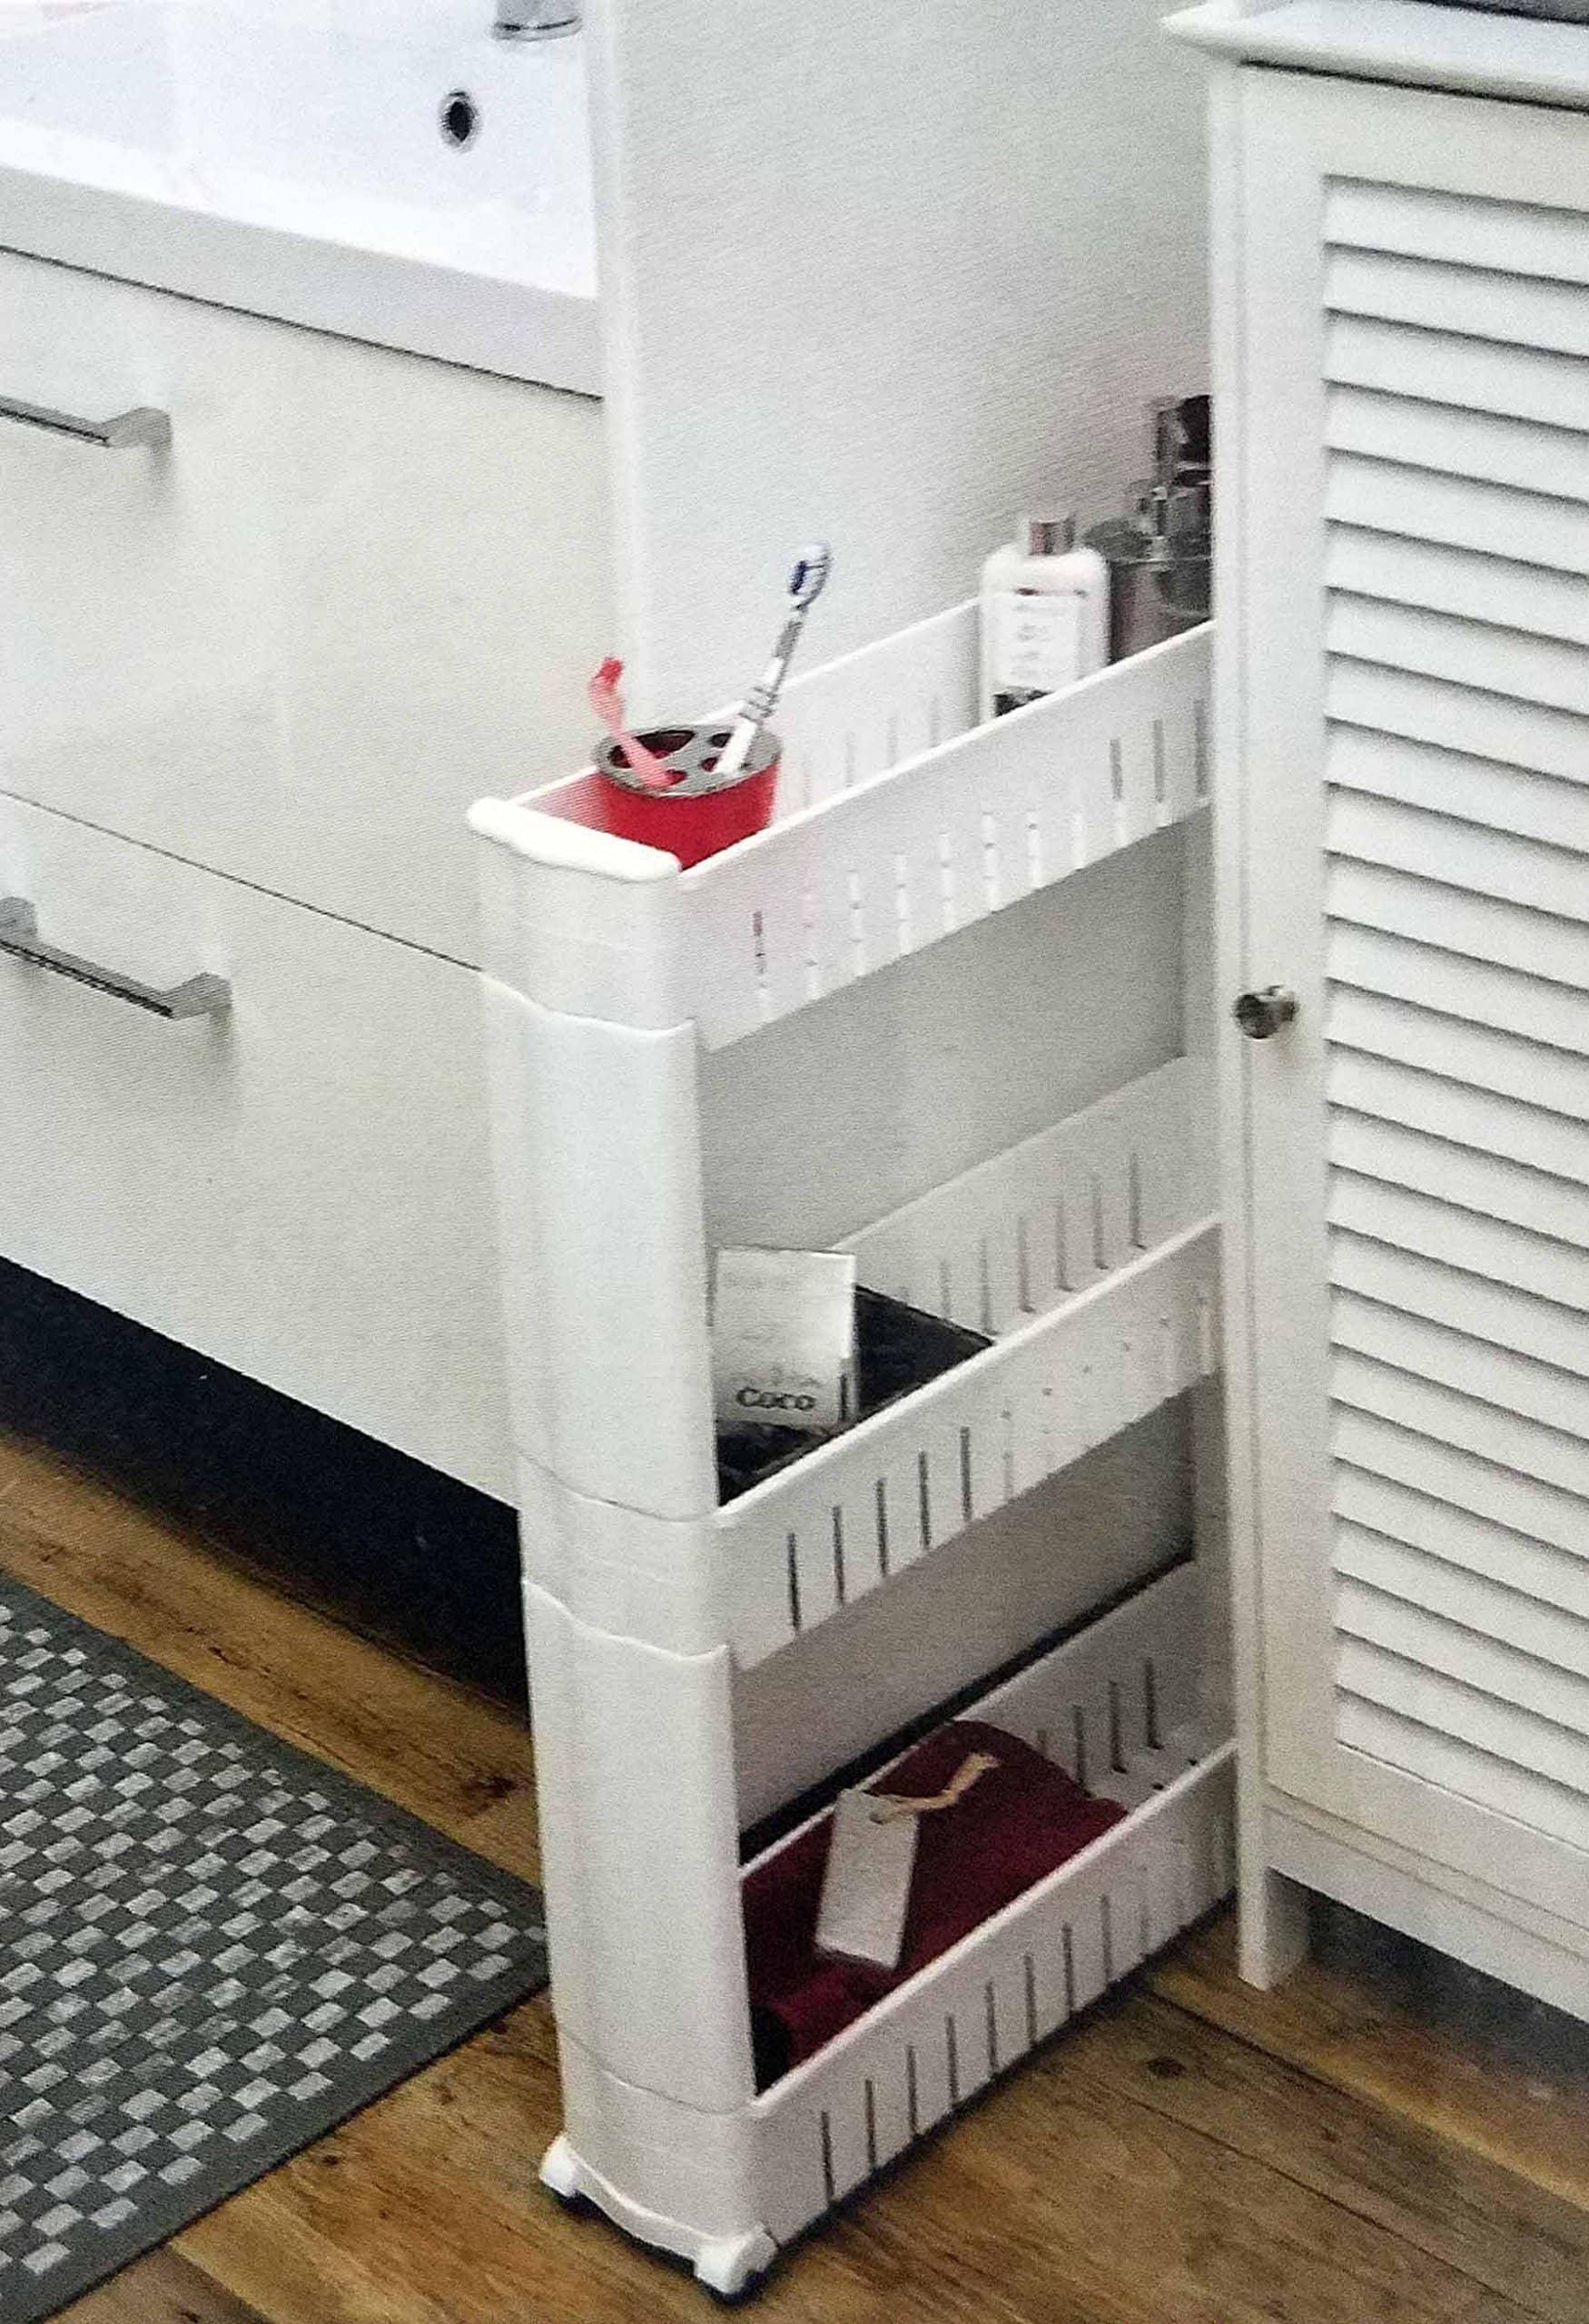 Keukenrek op wielen met 3 legvakken - 54x12x72 cm - Wit